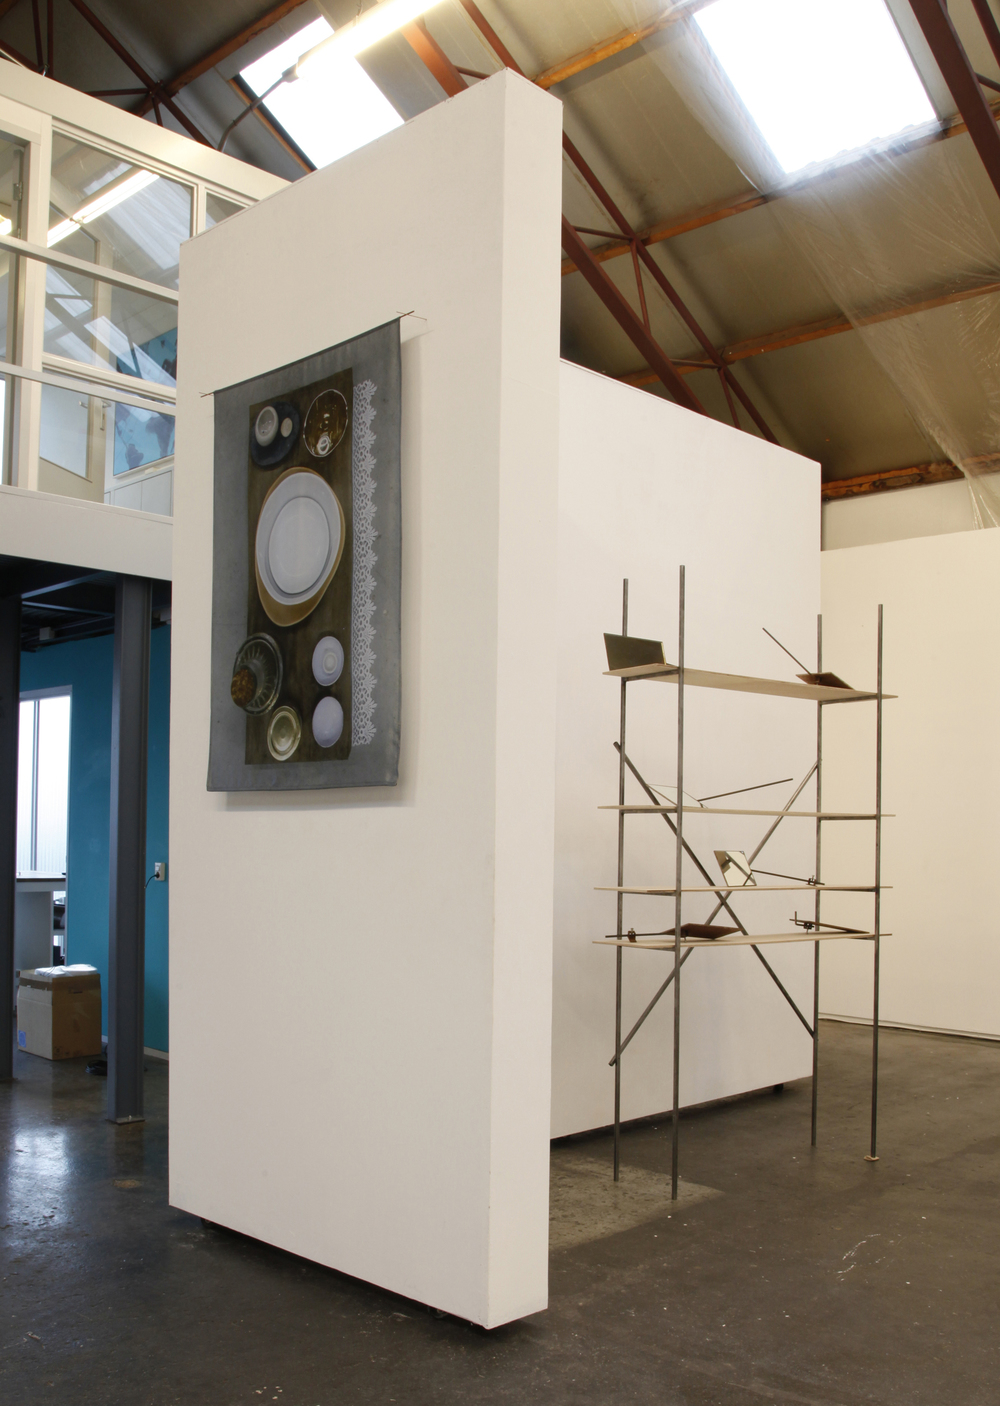 Valerie van Leersum, Spaces of Otherness and In Seek of Liminality,2015, installation view